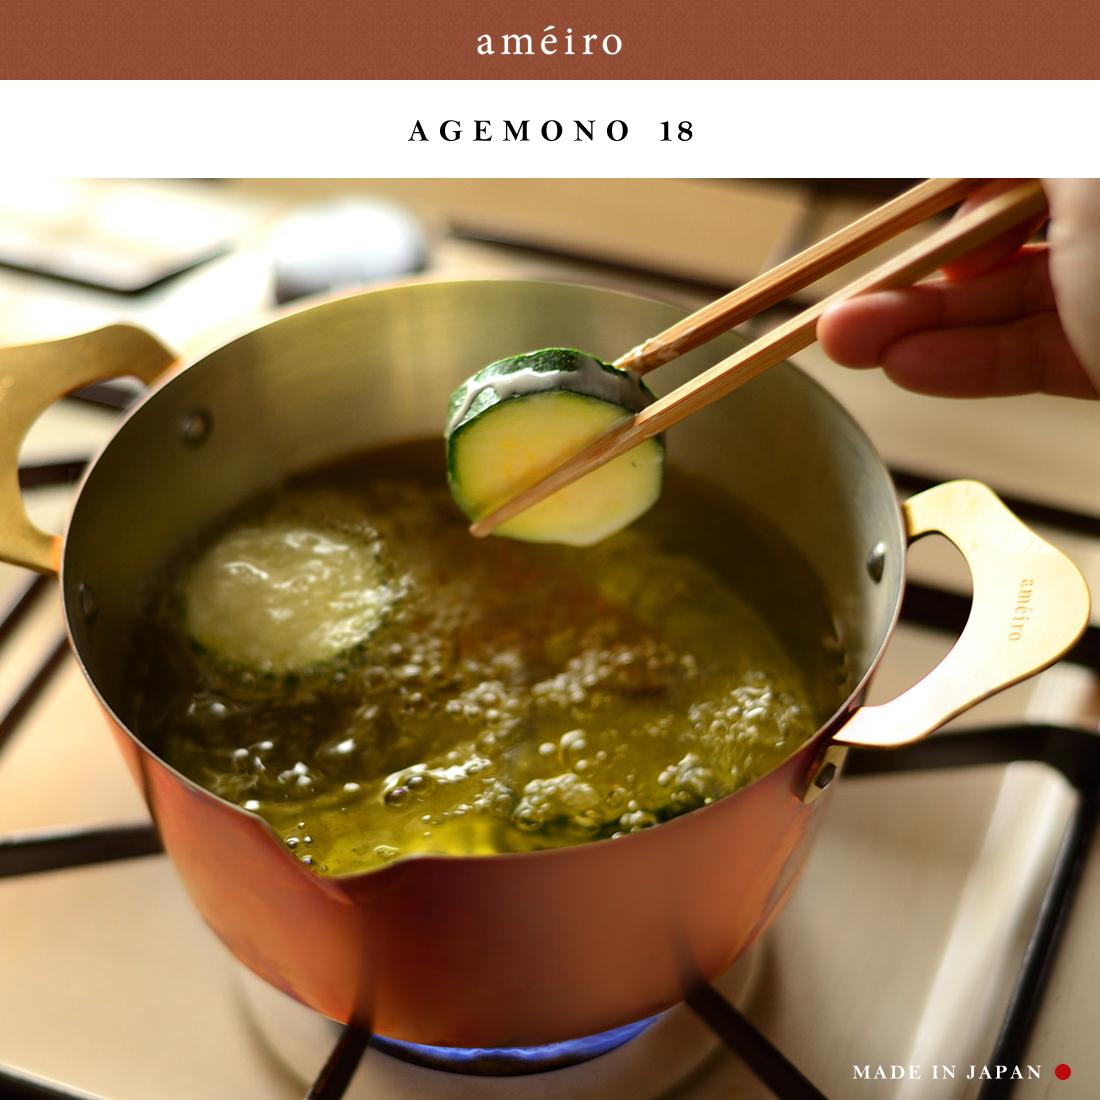 【ameiro】アメイロ 揚げ物鍋 18鍋 キッチン 日本製 銅製 両手鍋 【コンビニ受取対応商品】